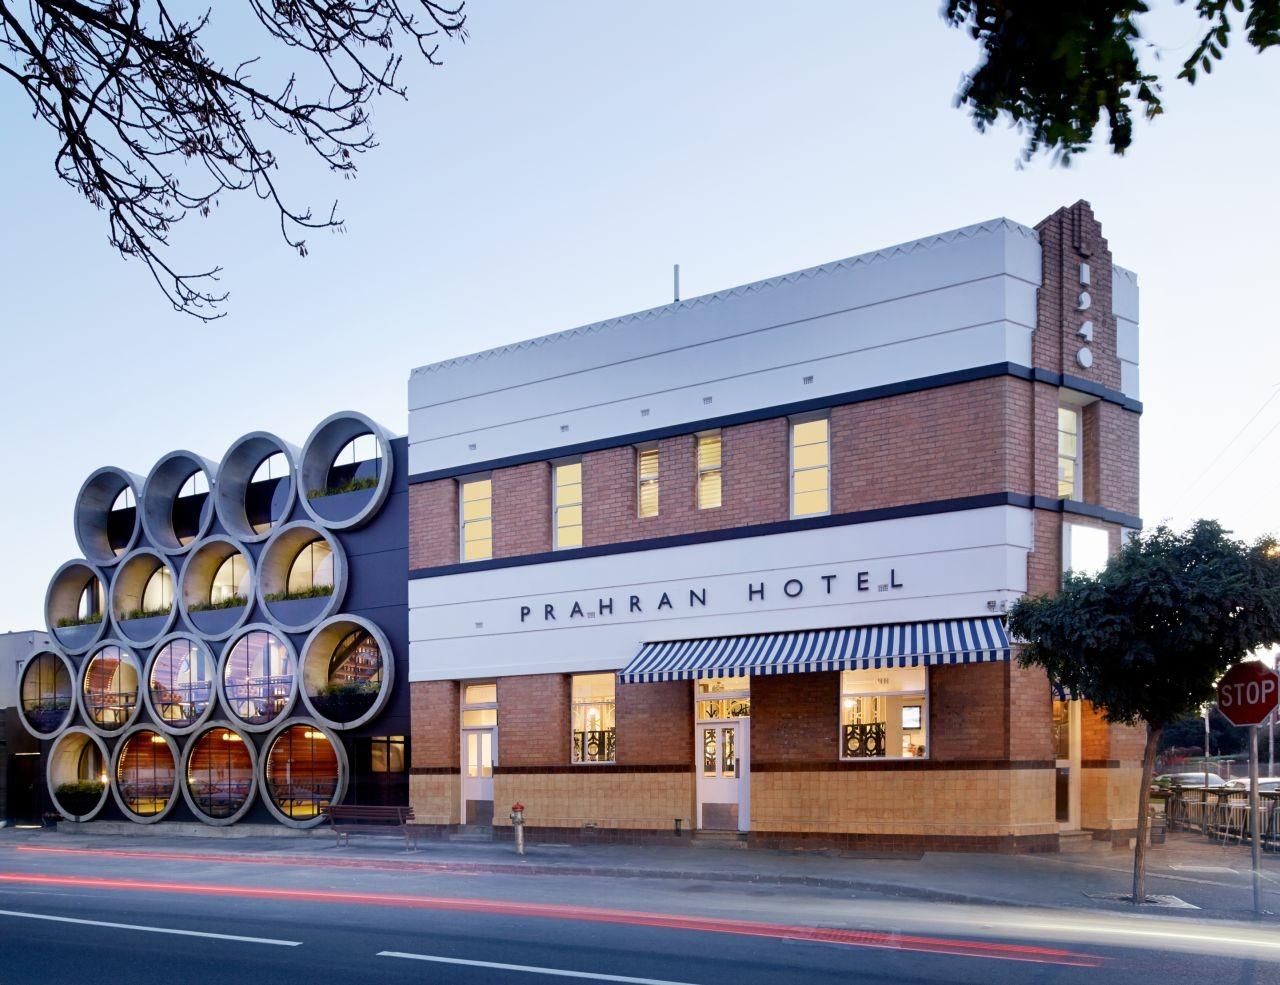 Prahran Hotel / Techne Architecture + Interior Design